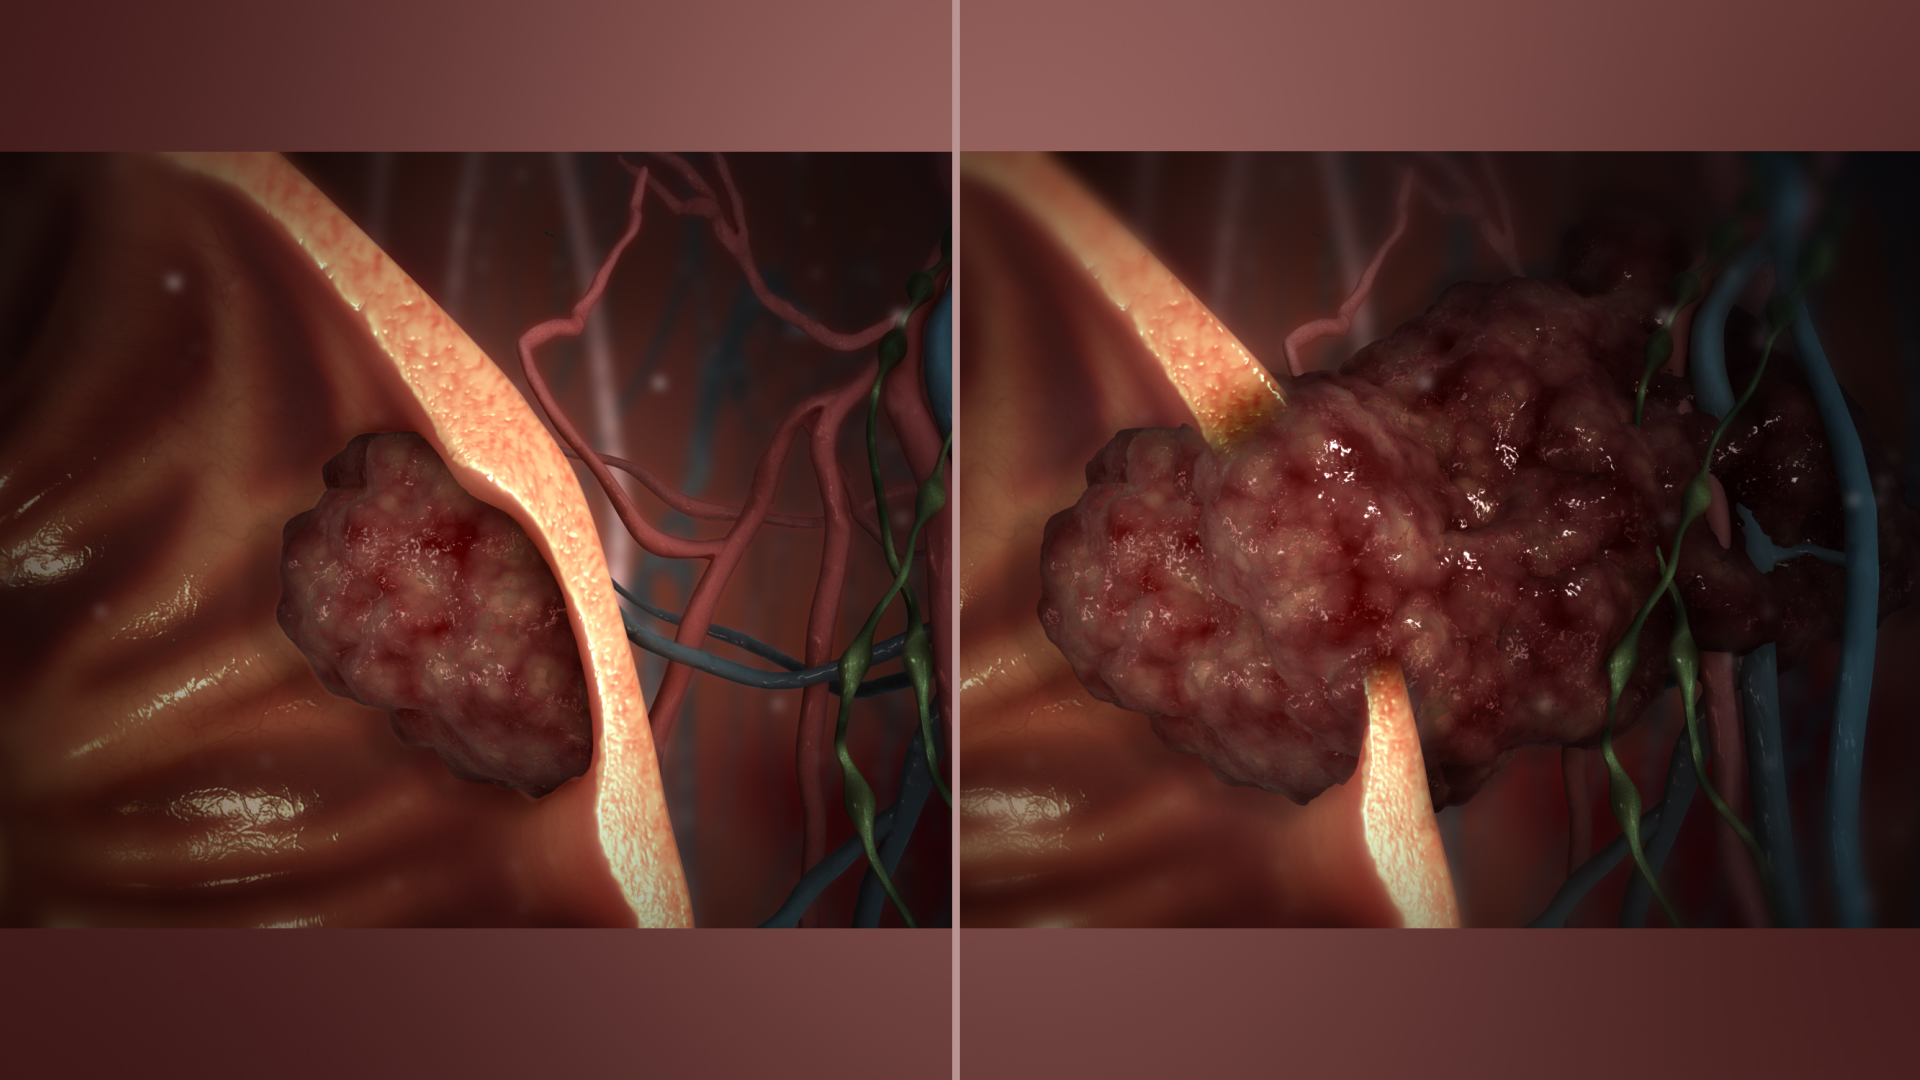 malignant neoplasm cancer